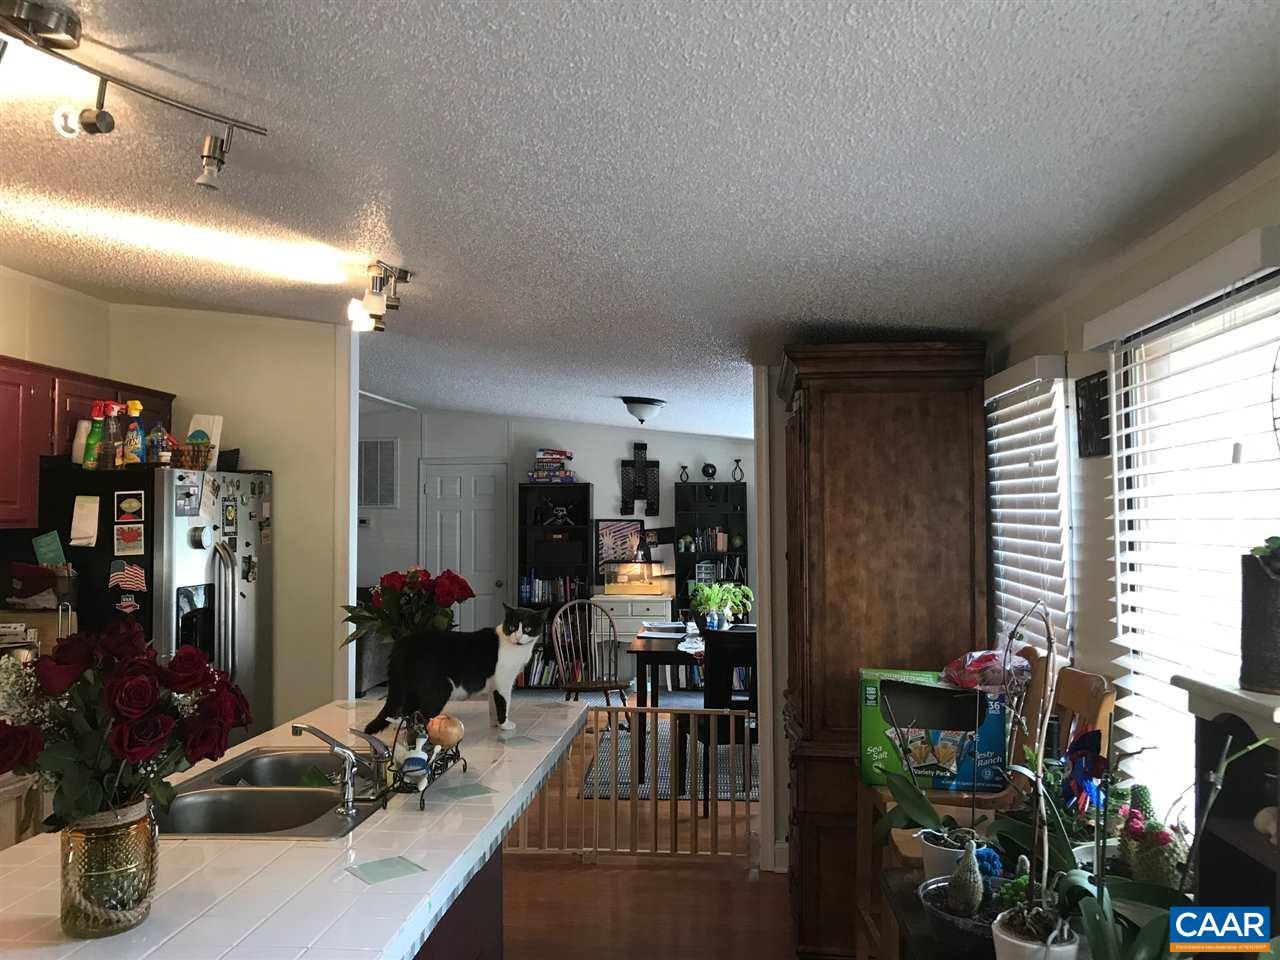 63 SANDY GIBSON RD, CROZET, VA 22932